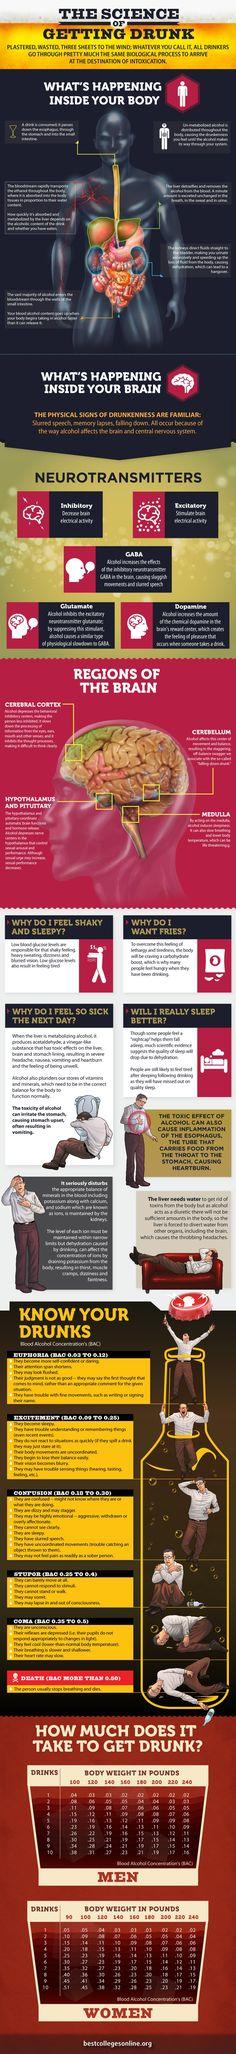 Sarhoş olmanın fizyolojisi #Infographics